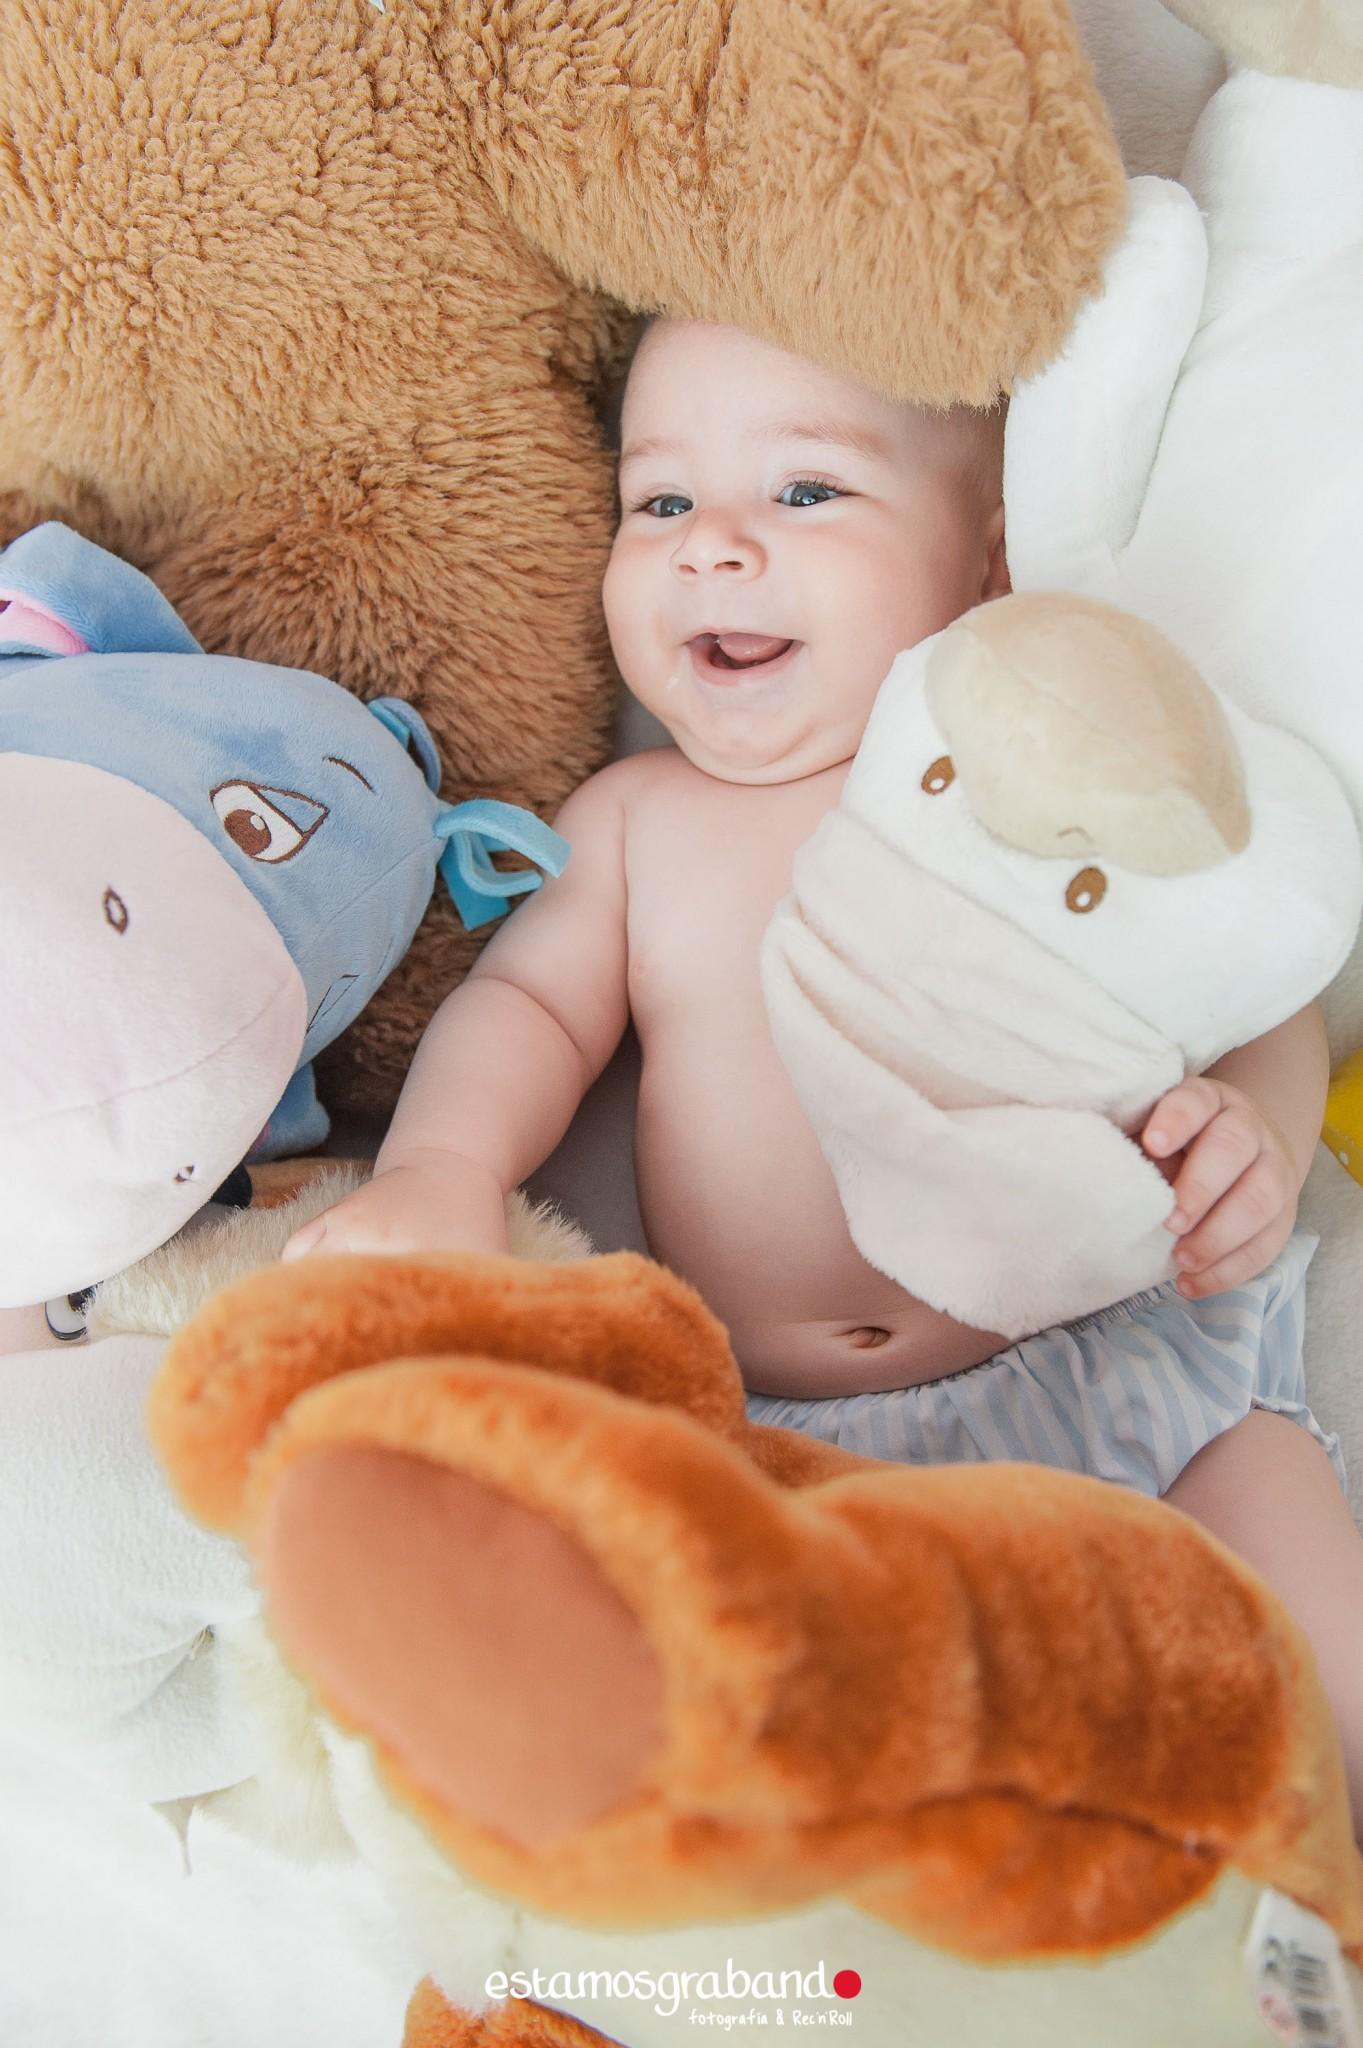 sesion-baby-pablo-newborn-fotografia-jerez-fotografia-bautizo-baby-sesion-fotos-de-bebe-25 Melocomo - video boda cadiz